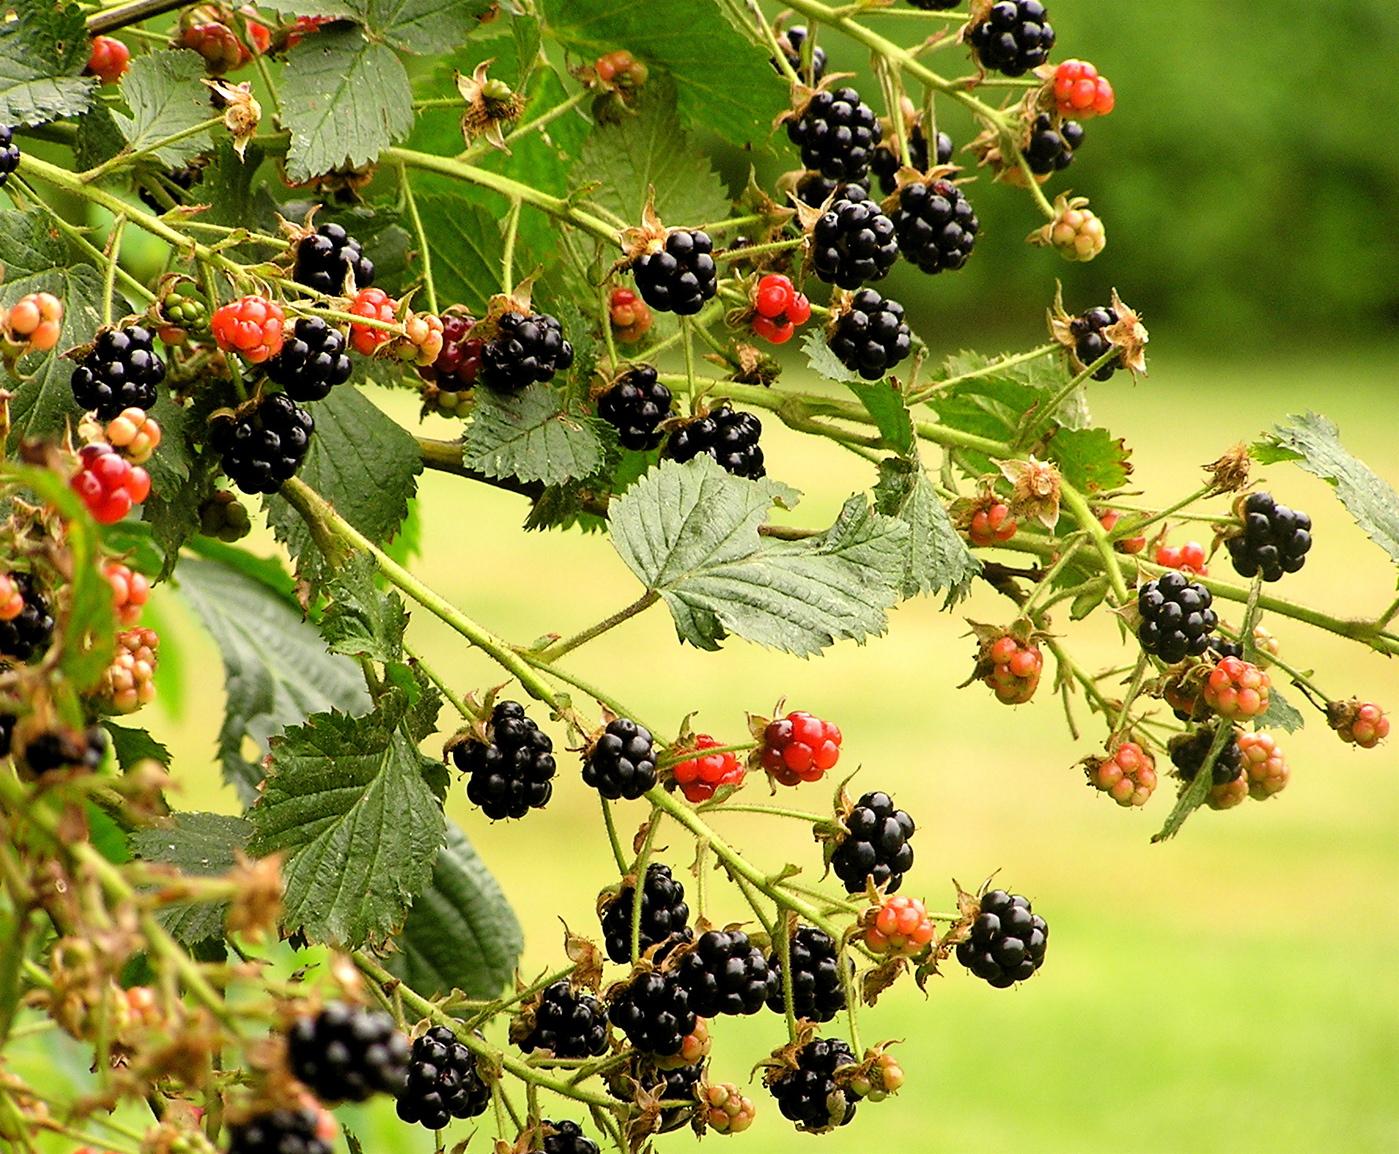 Wild Backyards : backyard wild blackberries  Flickr  Photo Sharing!